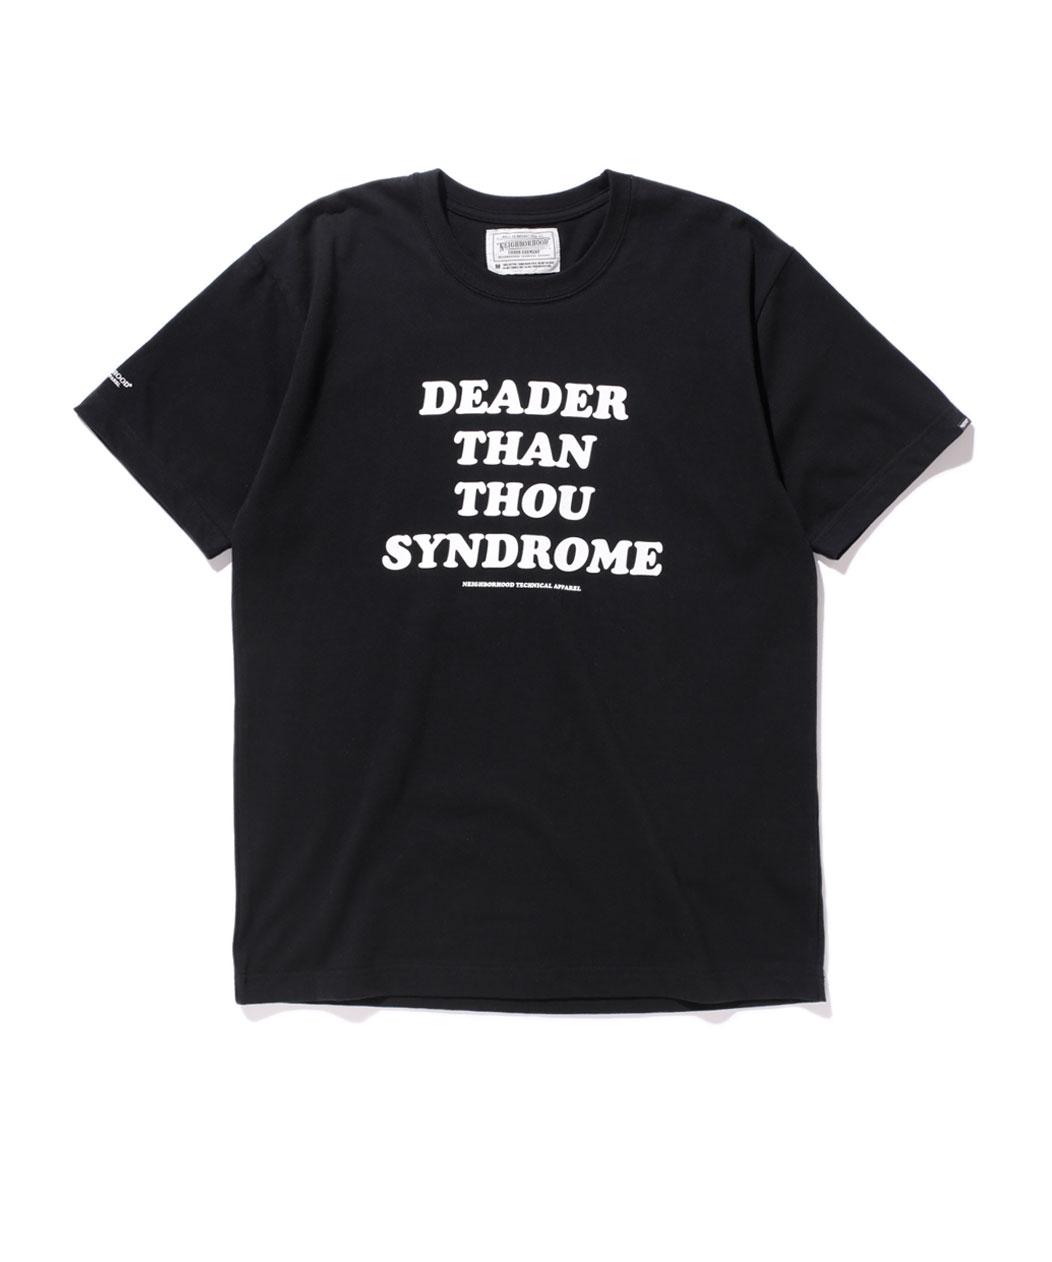 櫻井翔 嵐BLAST宮城 着用衣装 Tシャツ